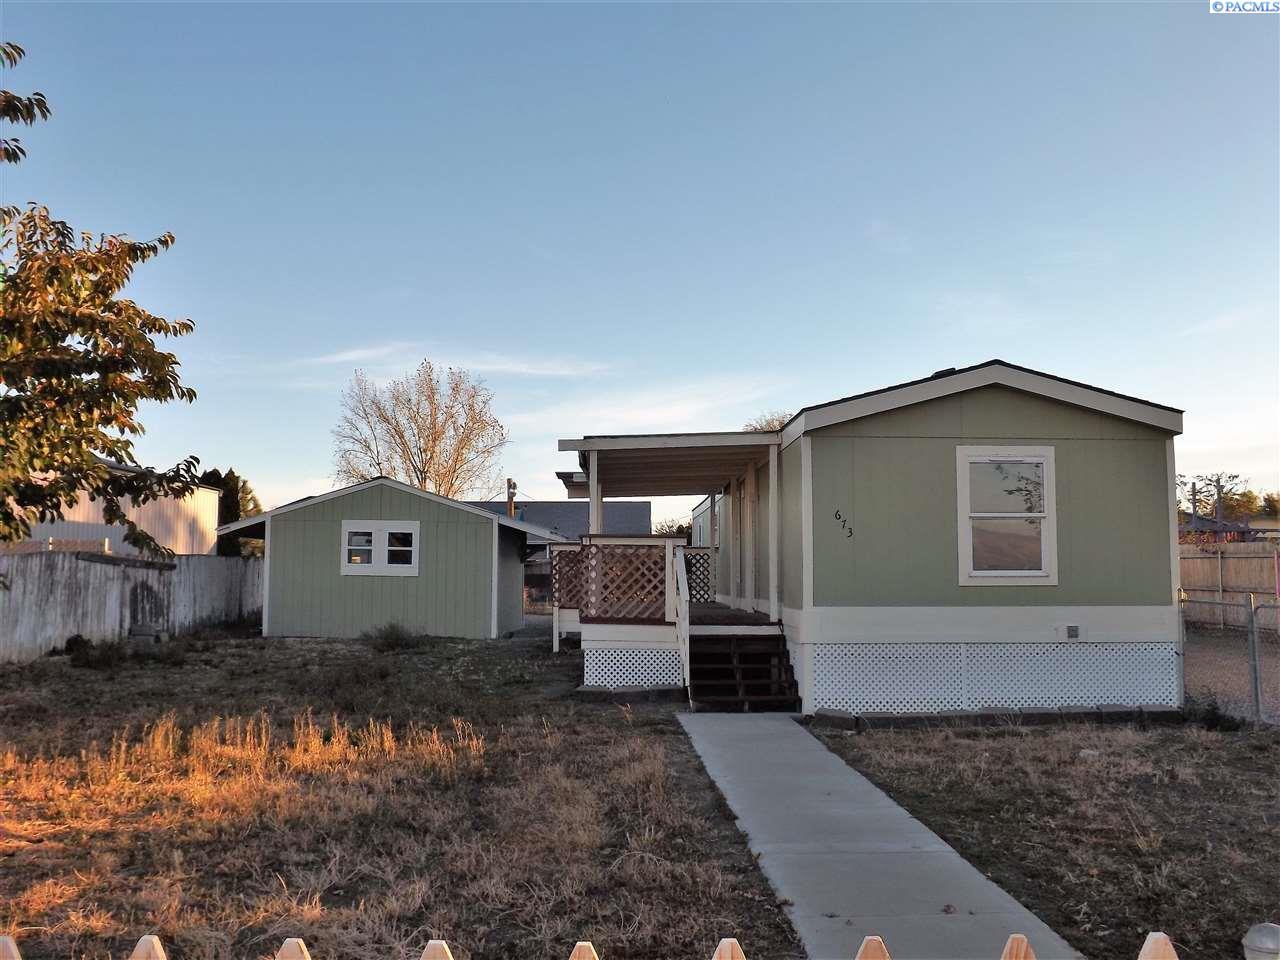 Single Family Home for Sale at 673 Hanson Loop 673 Hanson Loop Burbank, Washington 99323 United States